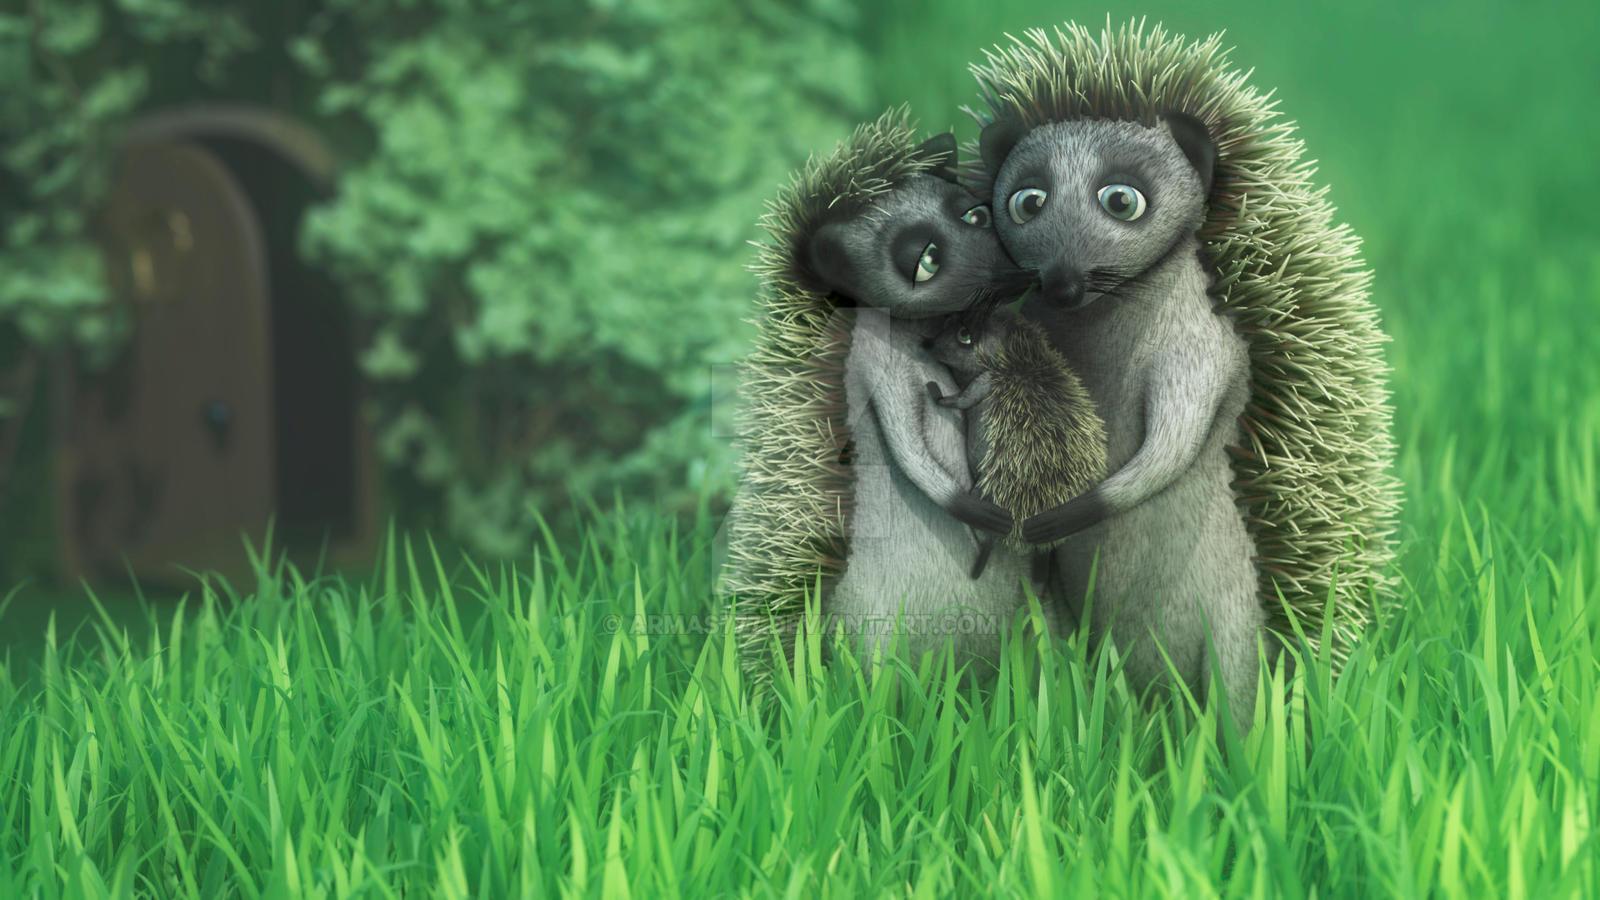 Hedgehog Family by armas777